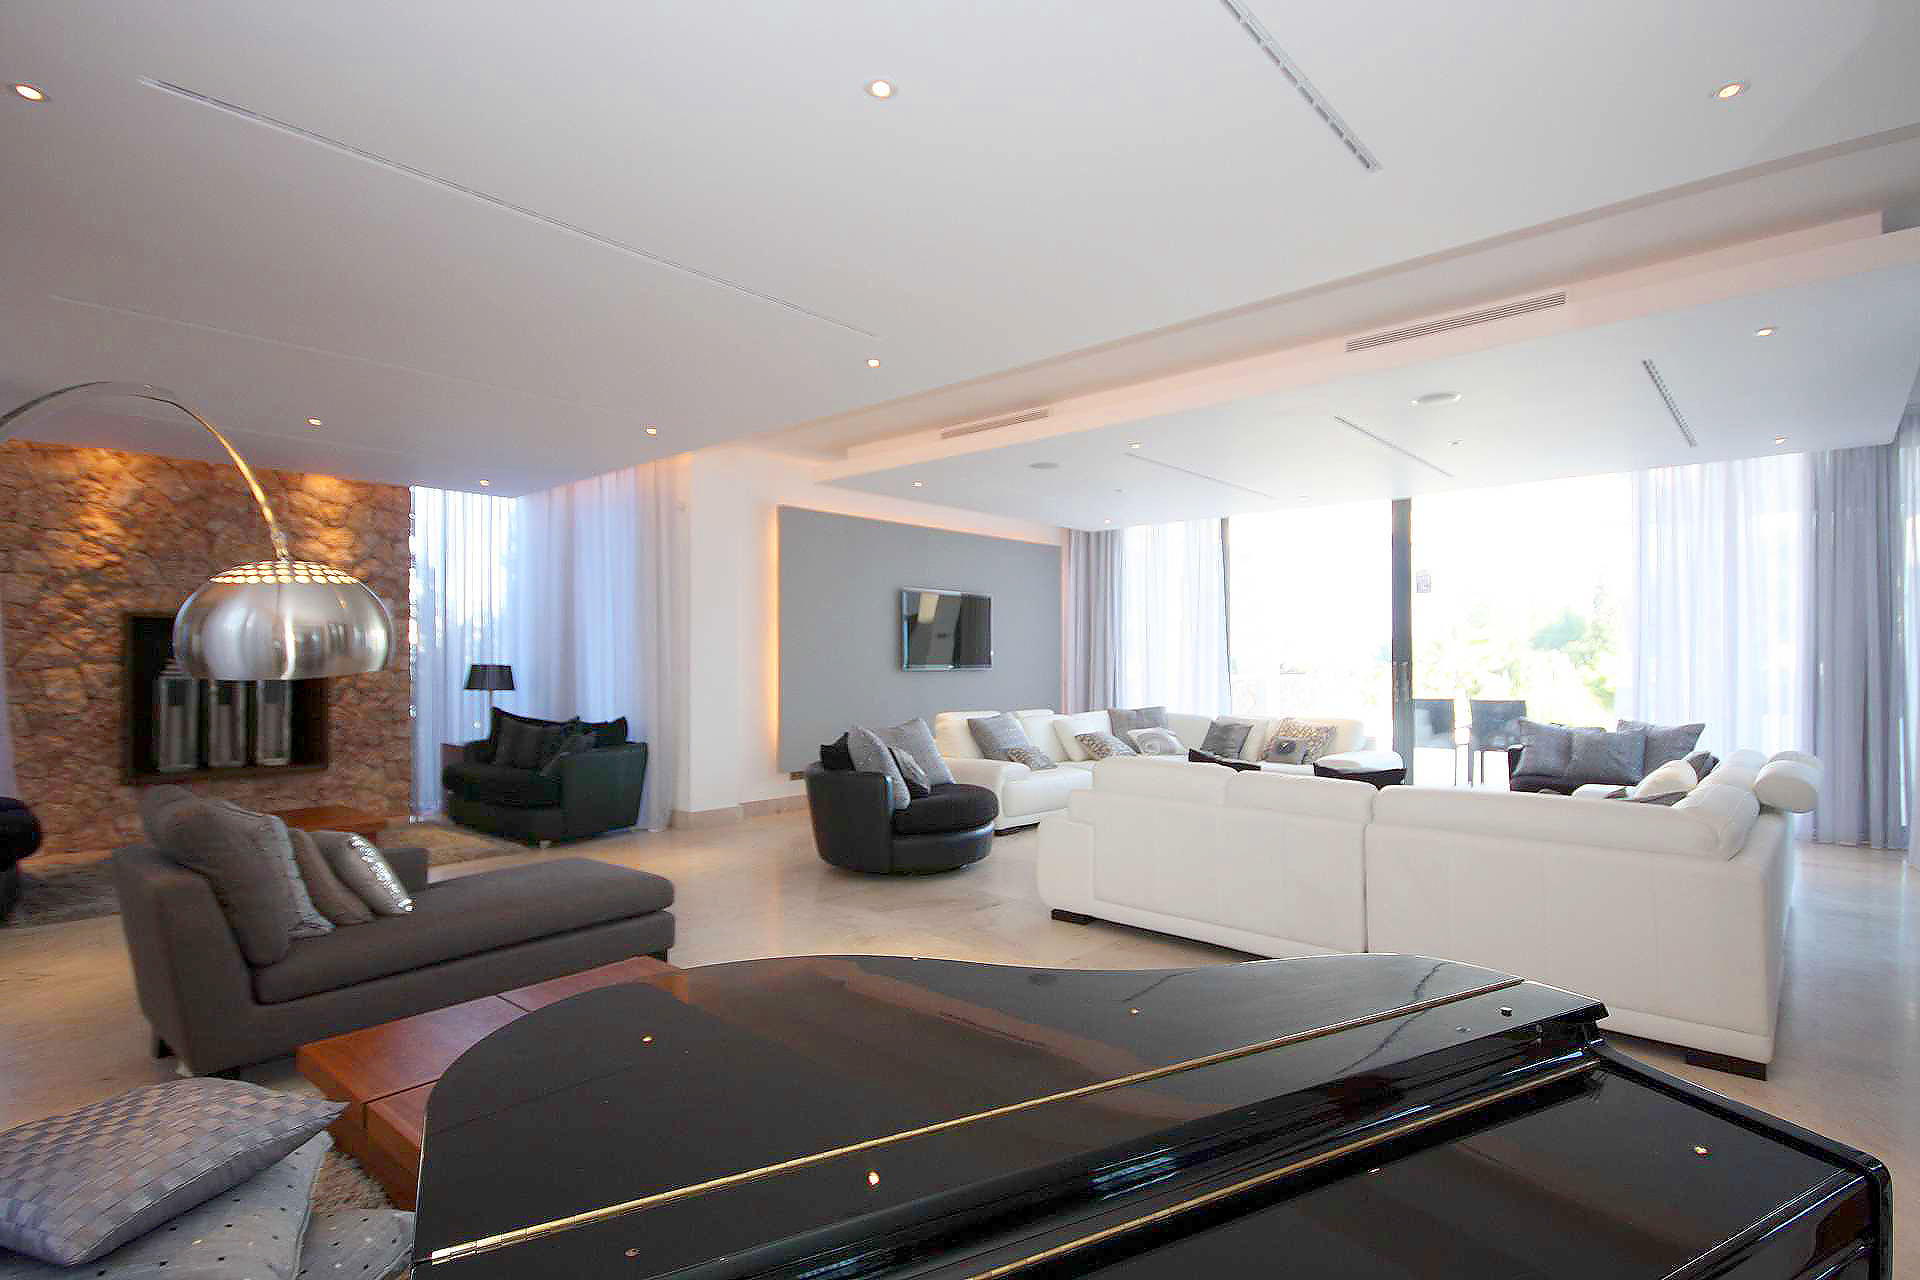 01-92 Design Villa Mallorca Südwesten Bild 11